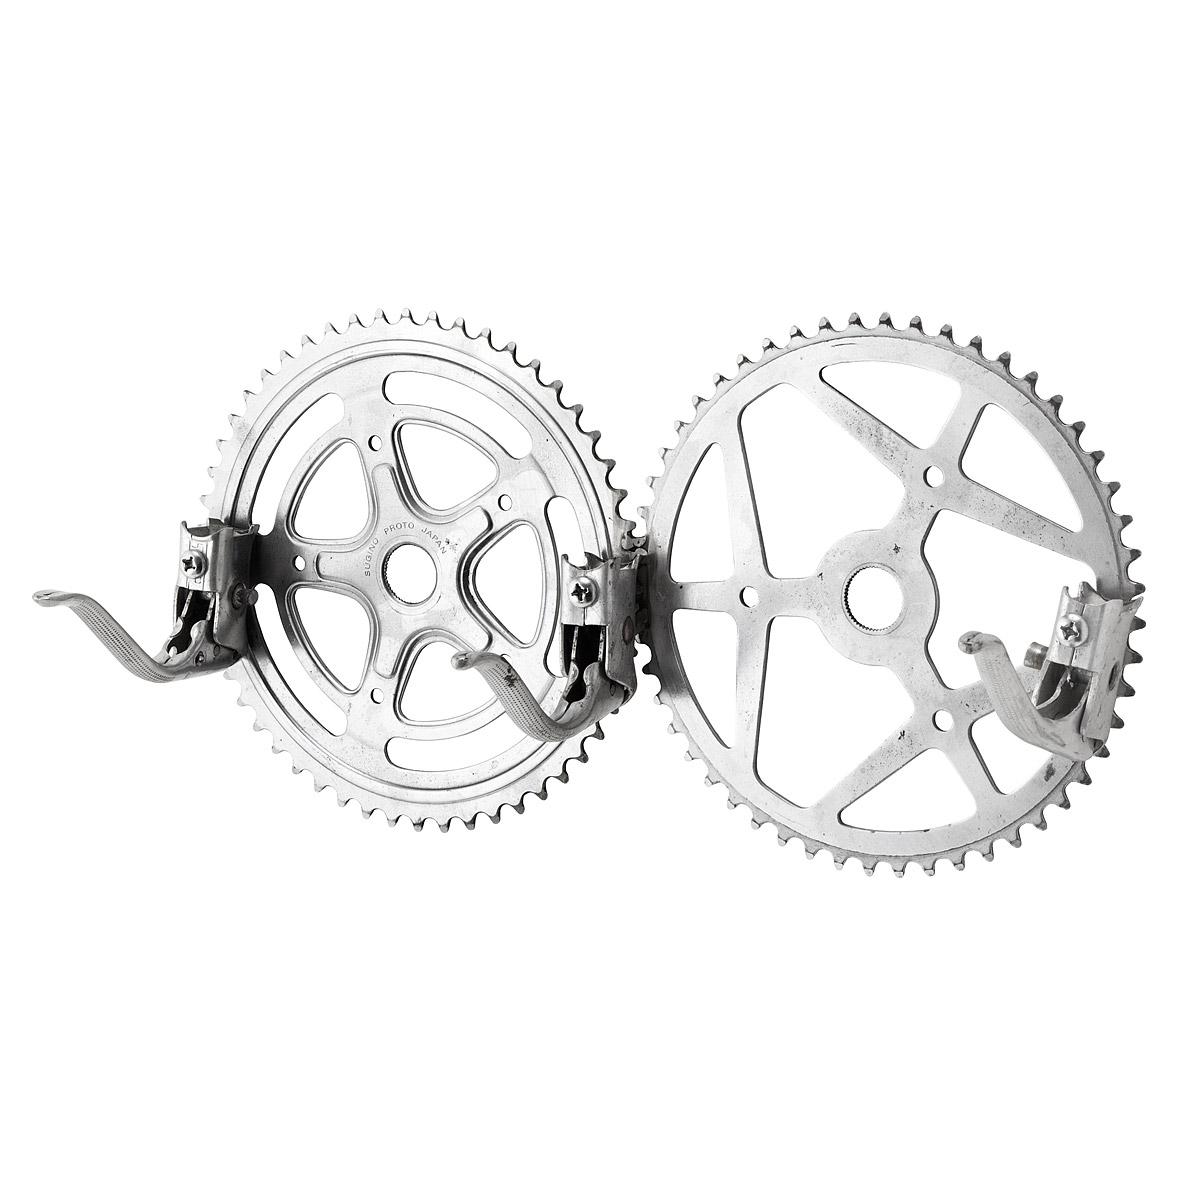 Bike Parts Brake Handles recently viewed